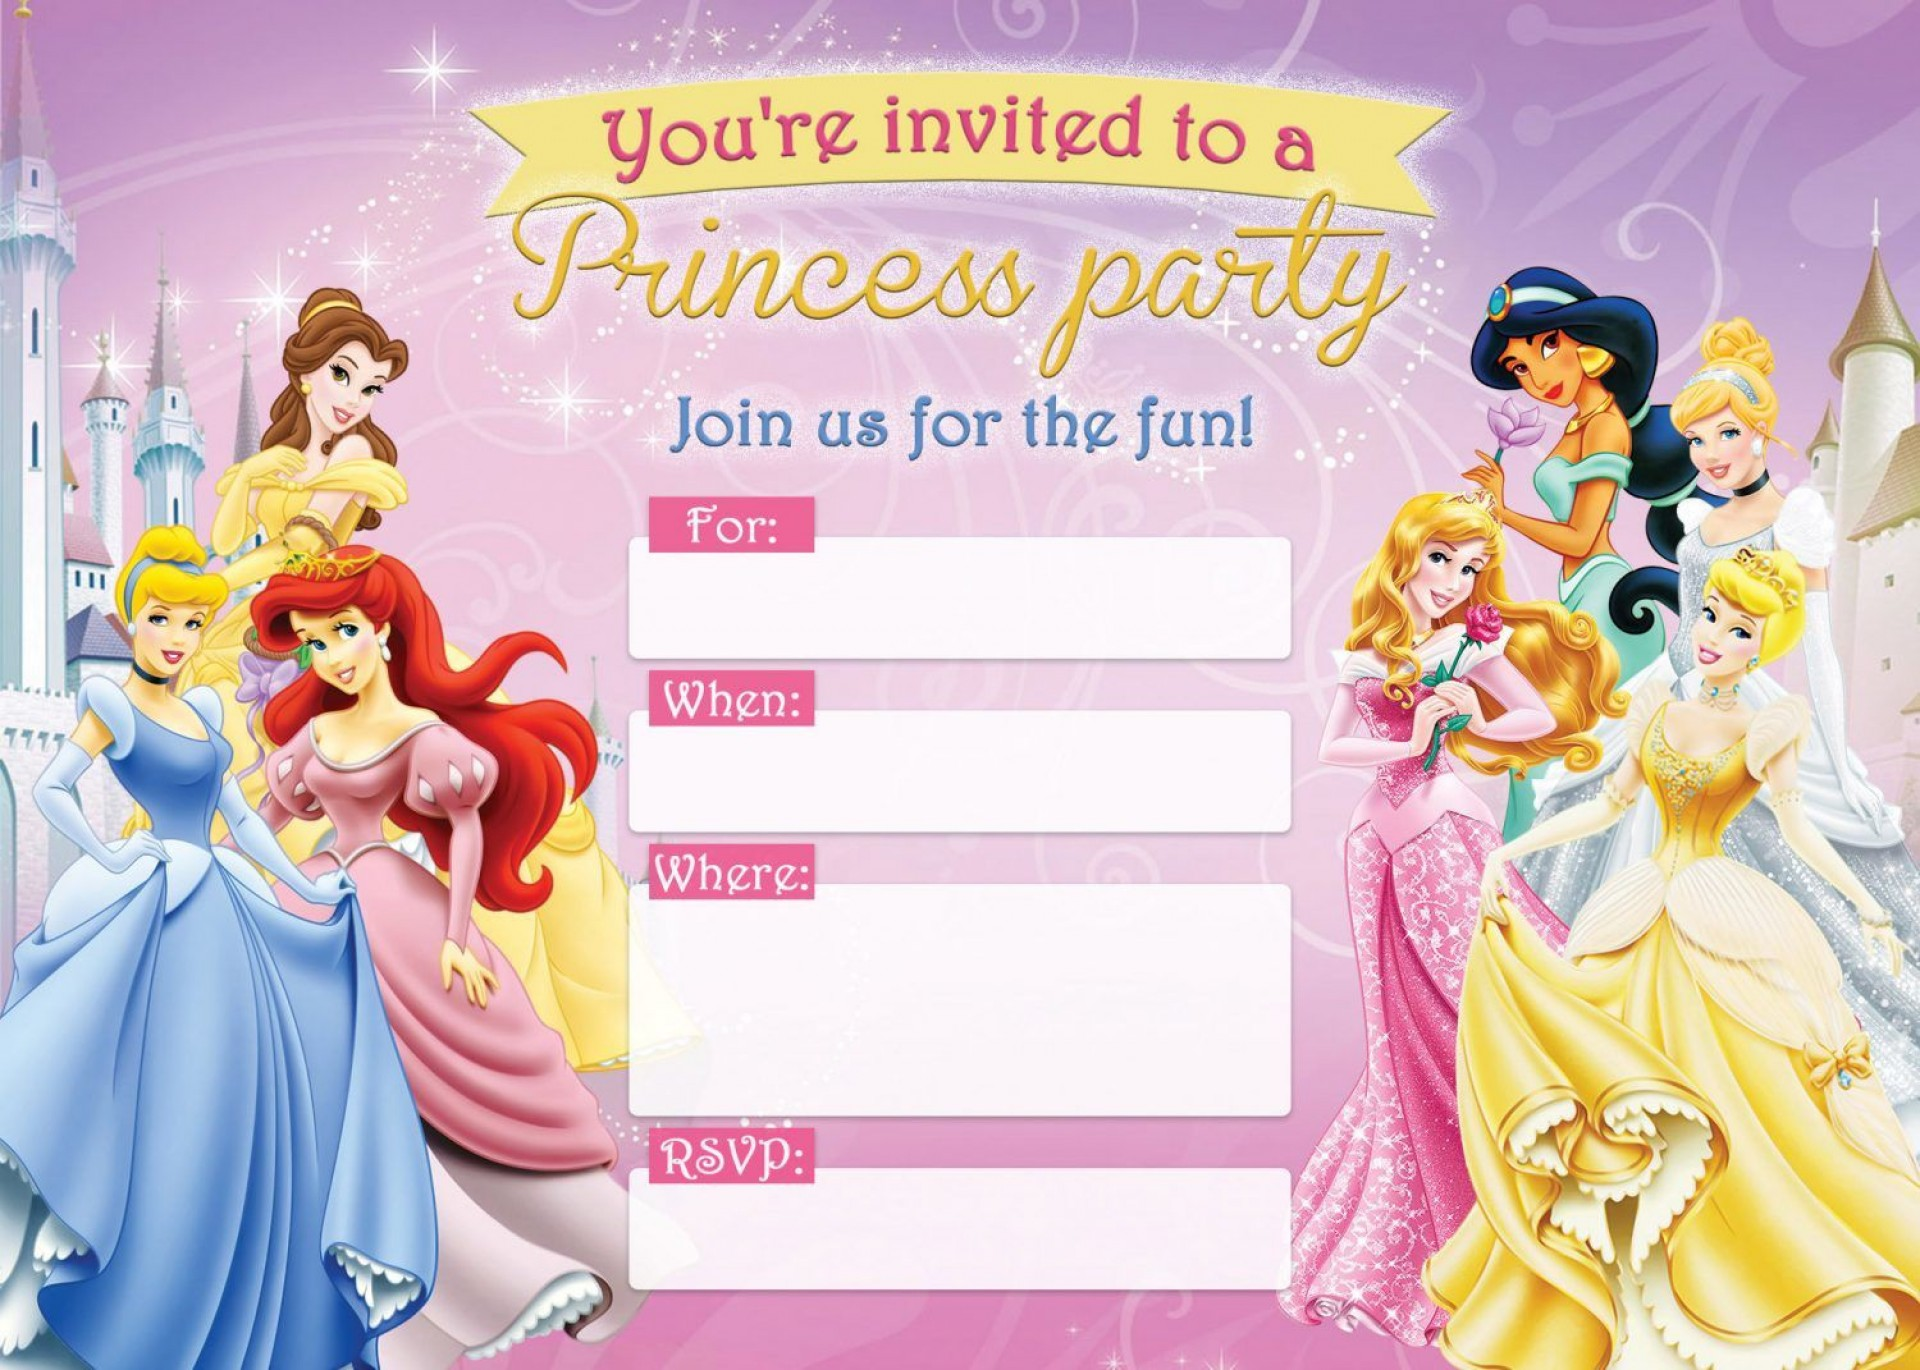 004 Unbelievable Disney Princes Invitation Template Idea  Downloadable Party Free Printable Birthday1920